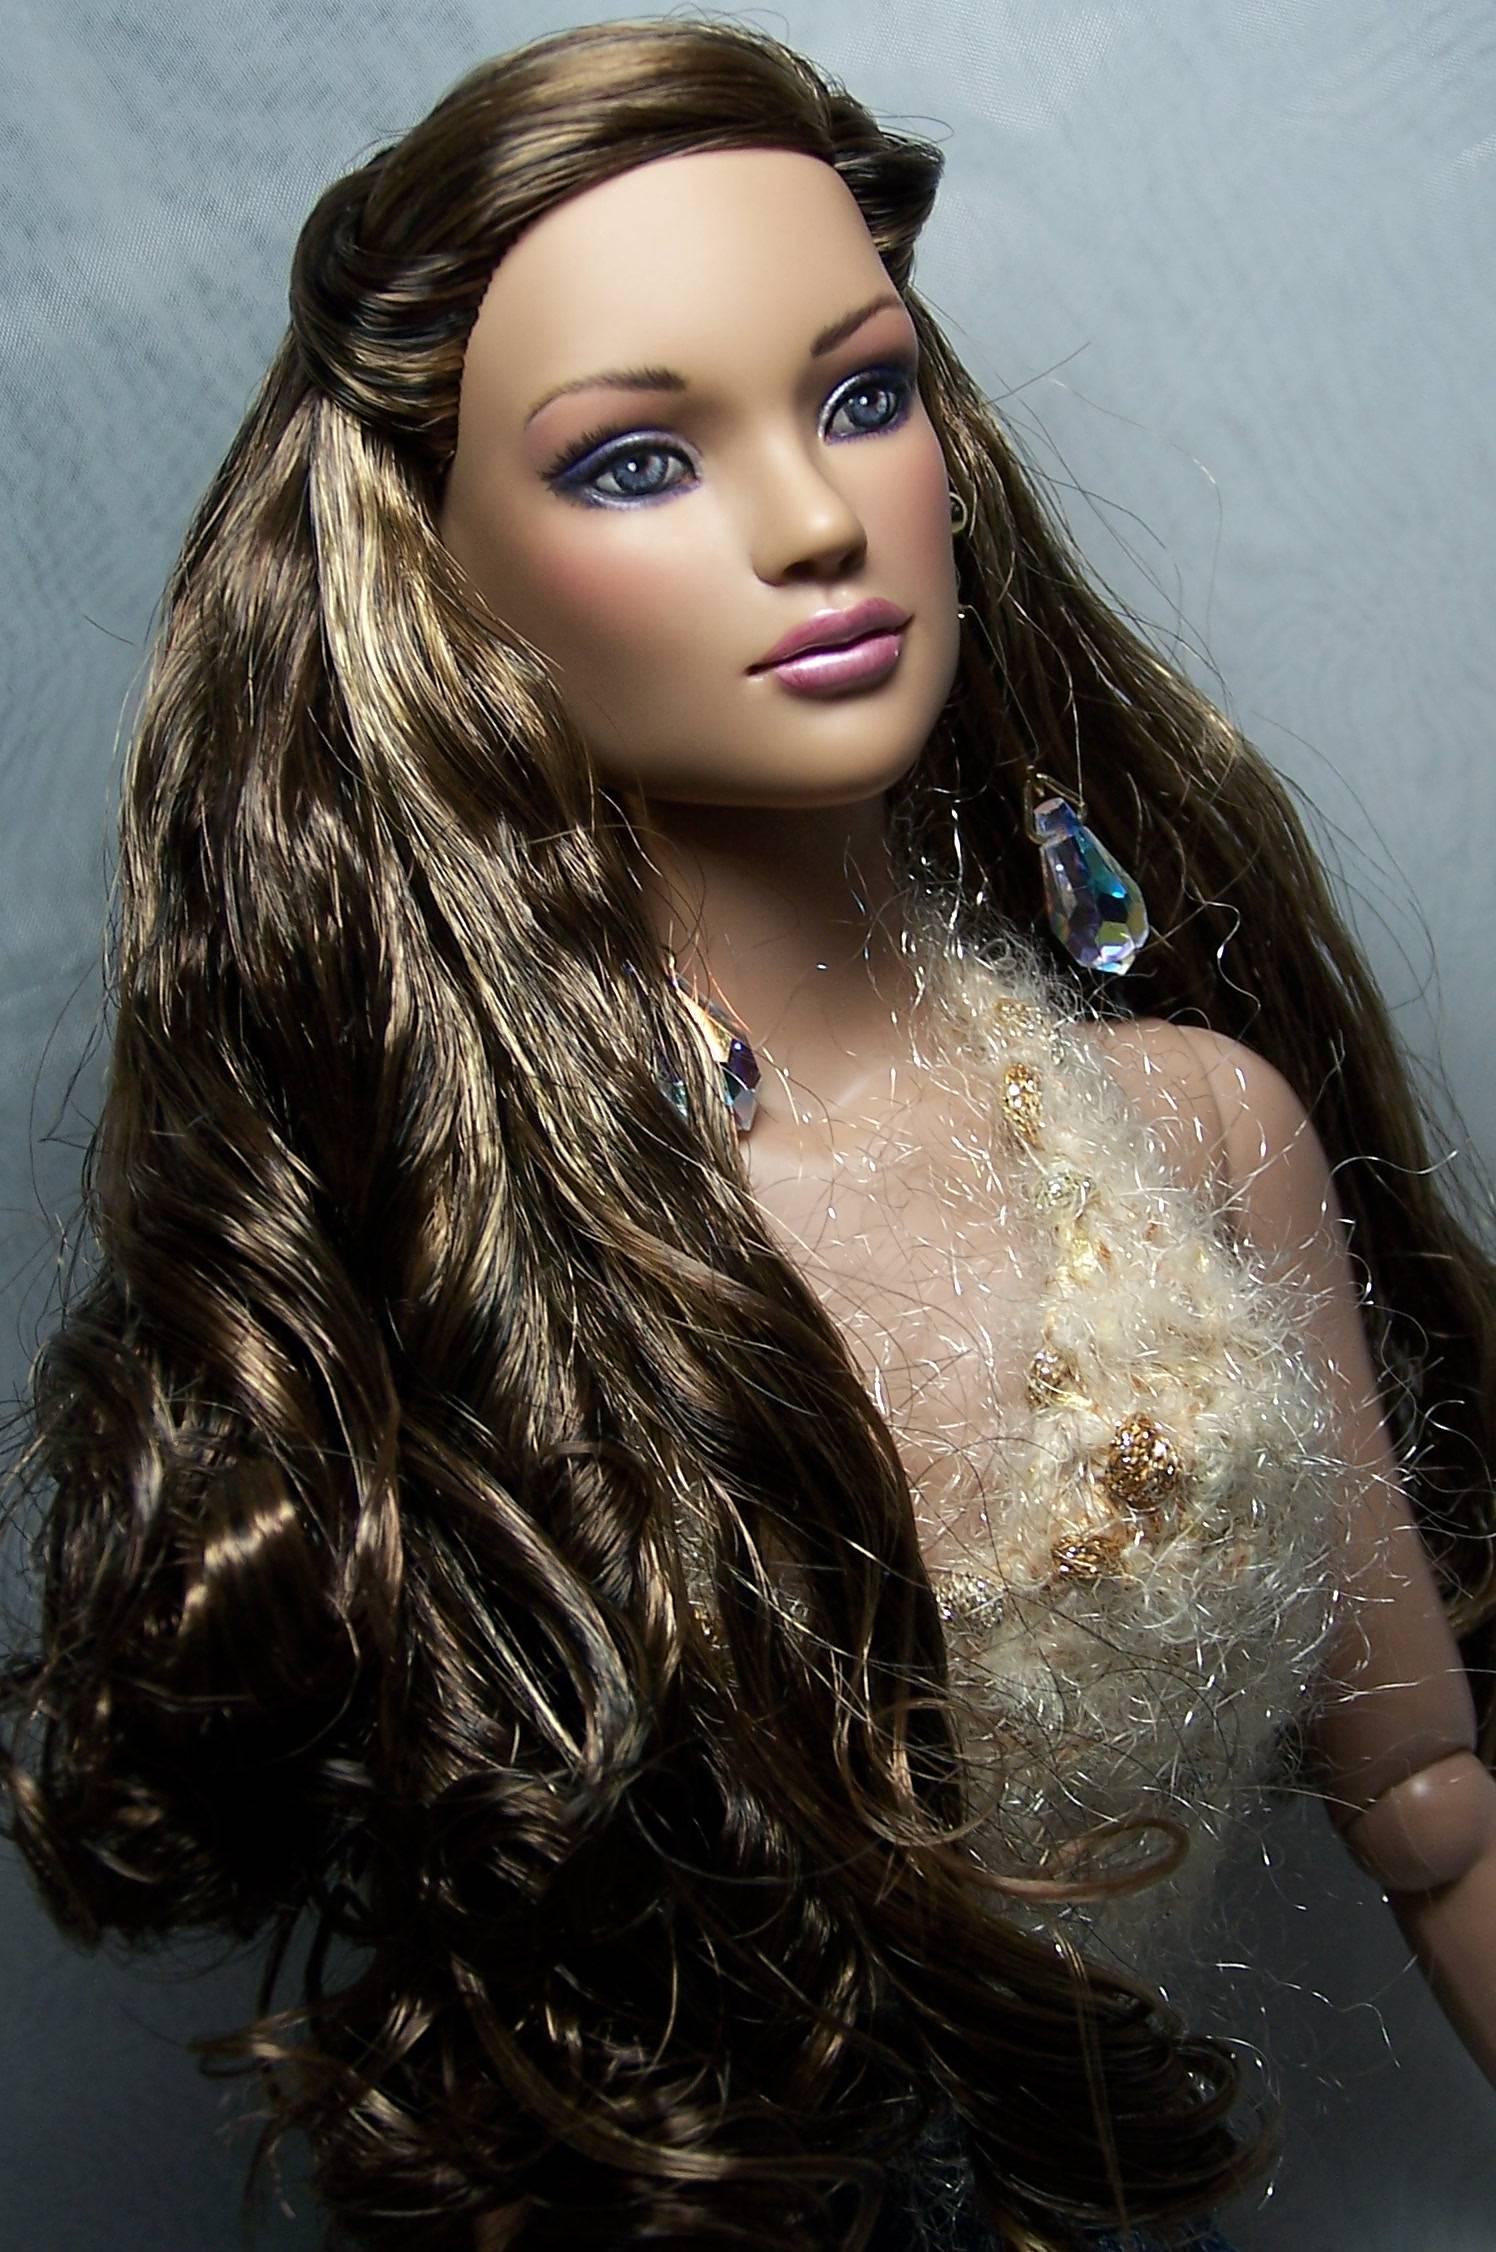 GlindaShiloh auction photos (2).jpg